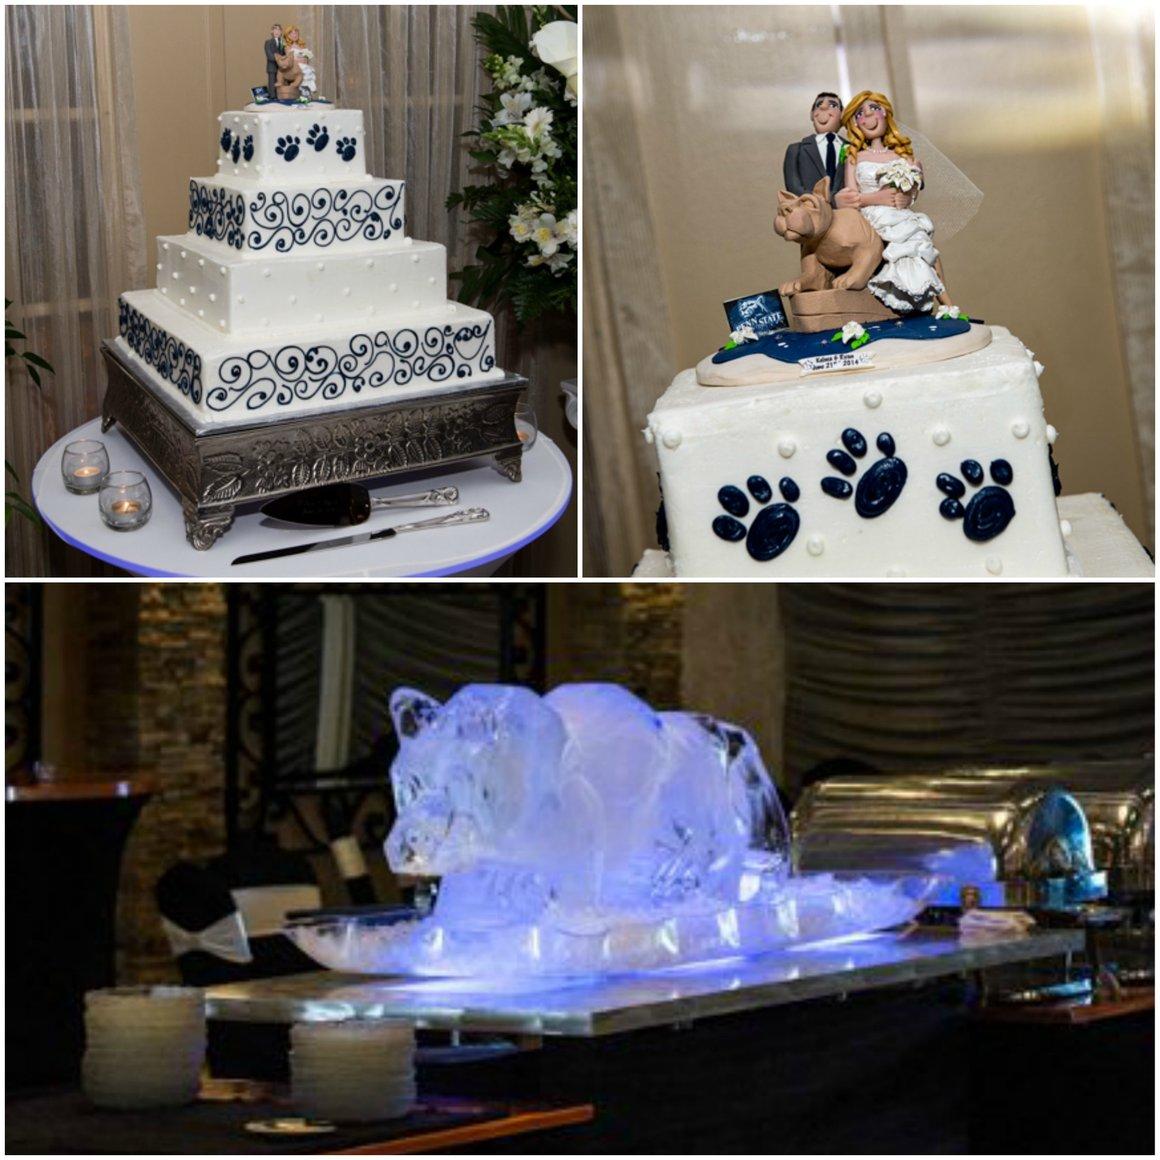 Food Lion Wedding Cakes: Penn State Love Stories 2015-16: A Penn State Wedding